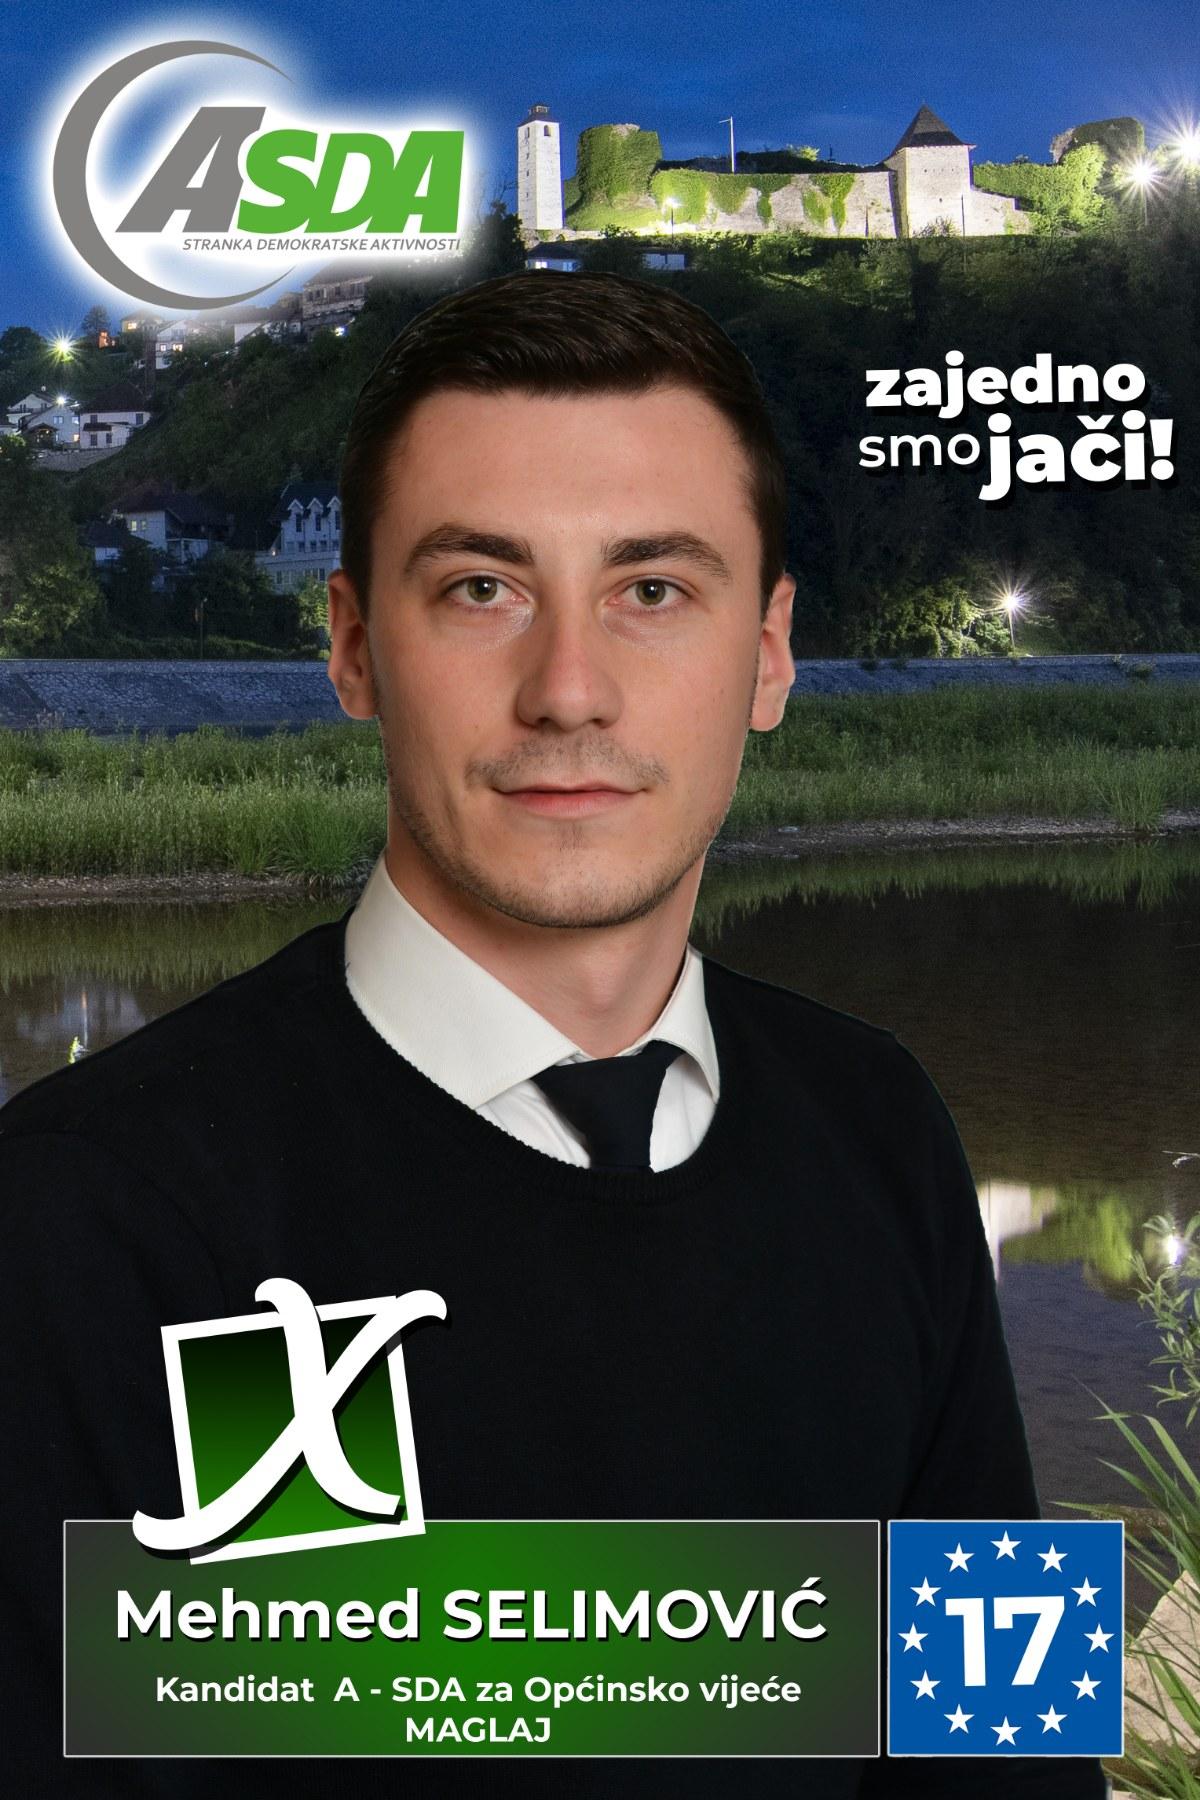 Mehmed Selimović